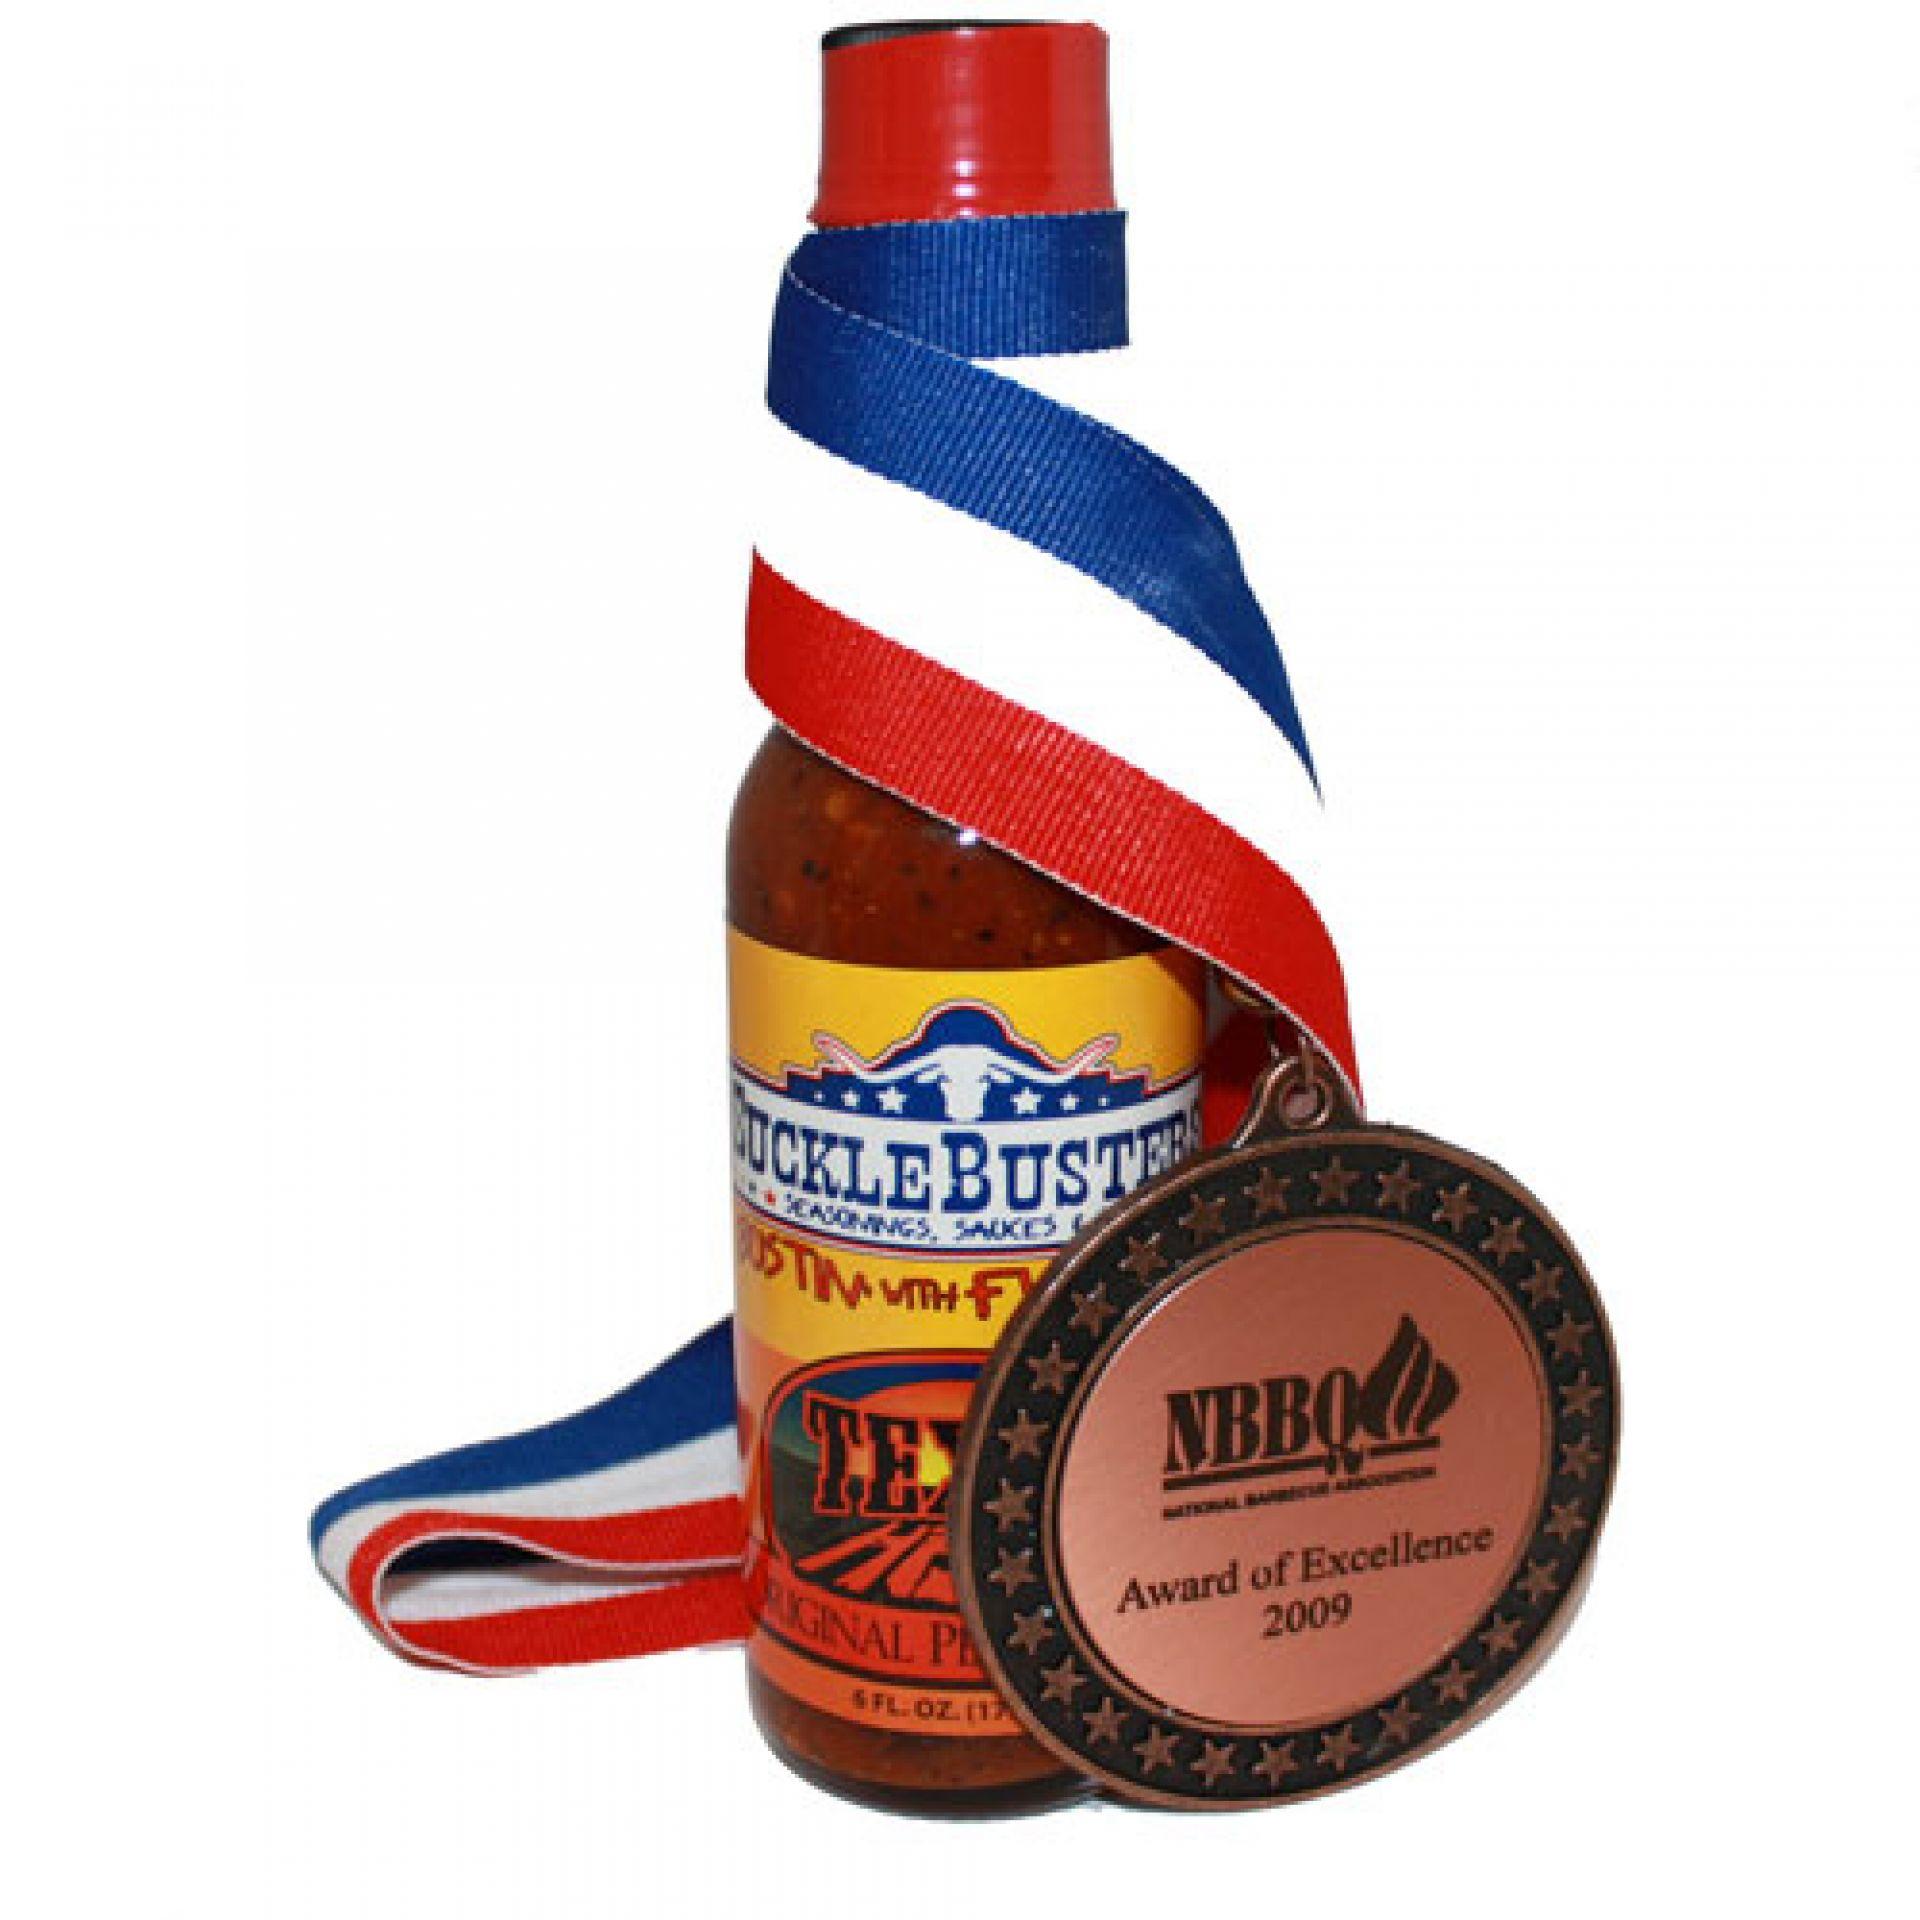 Suckle Busters Texas Heat Original Pepper Sauce